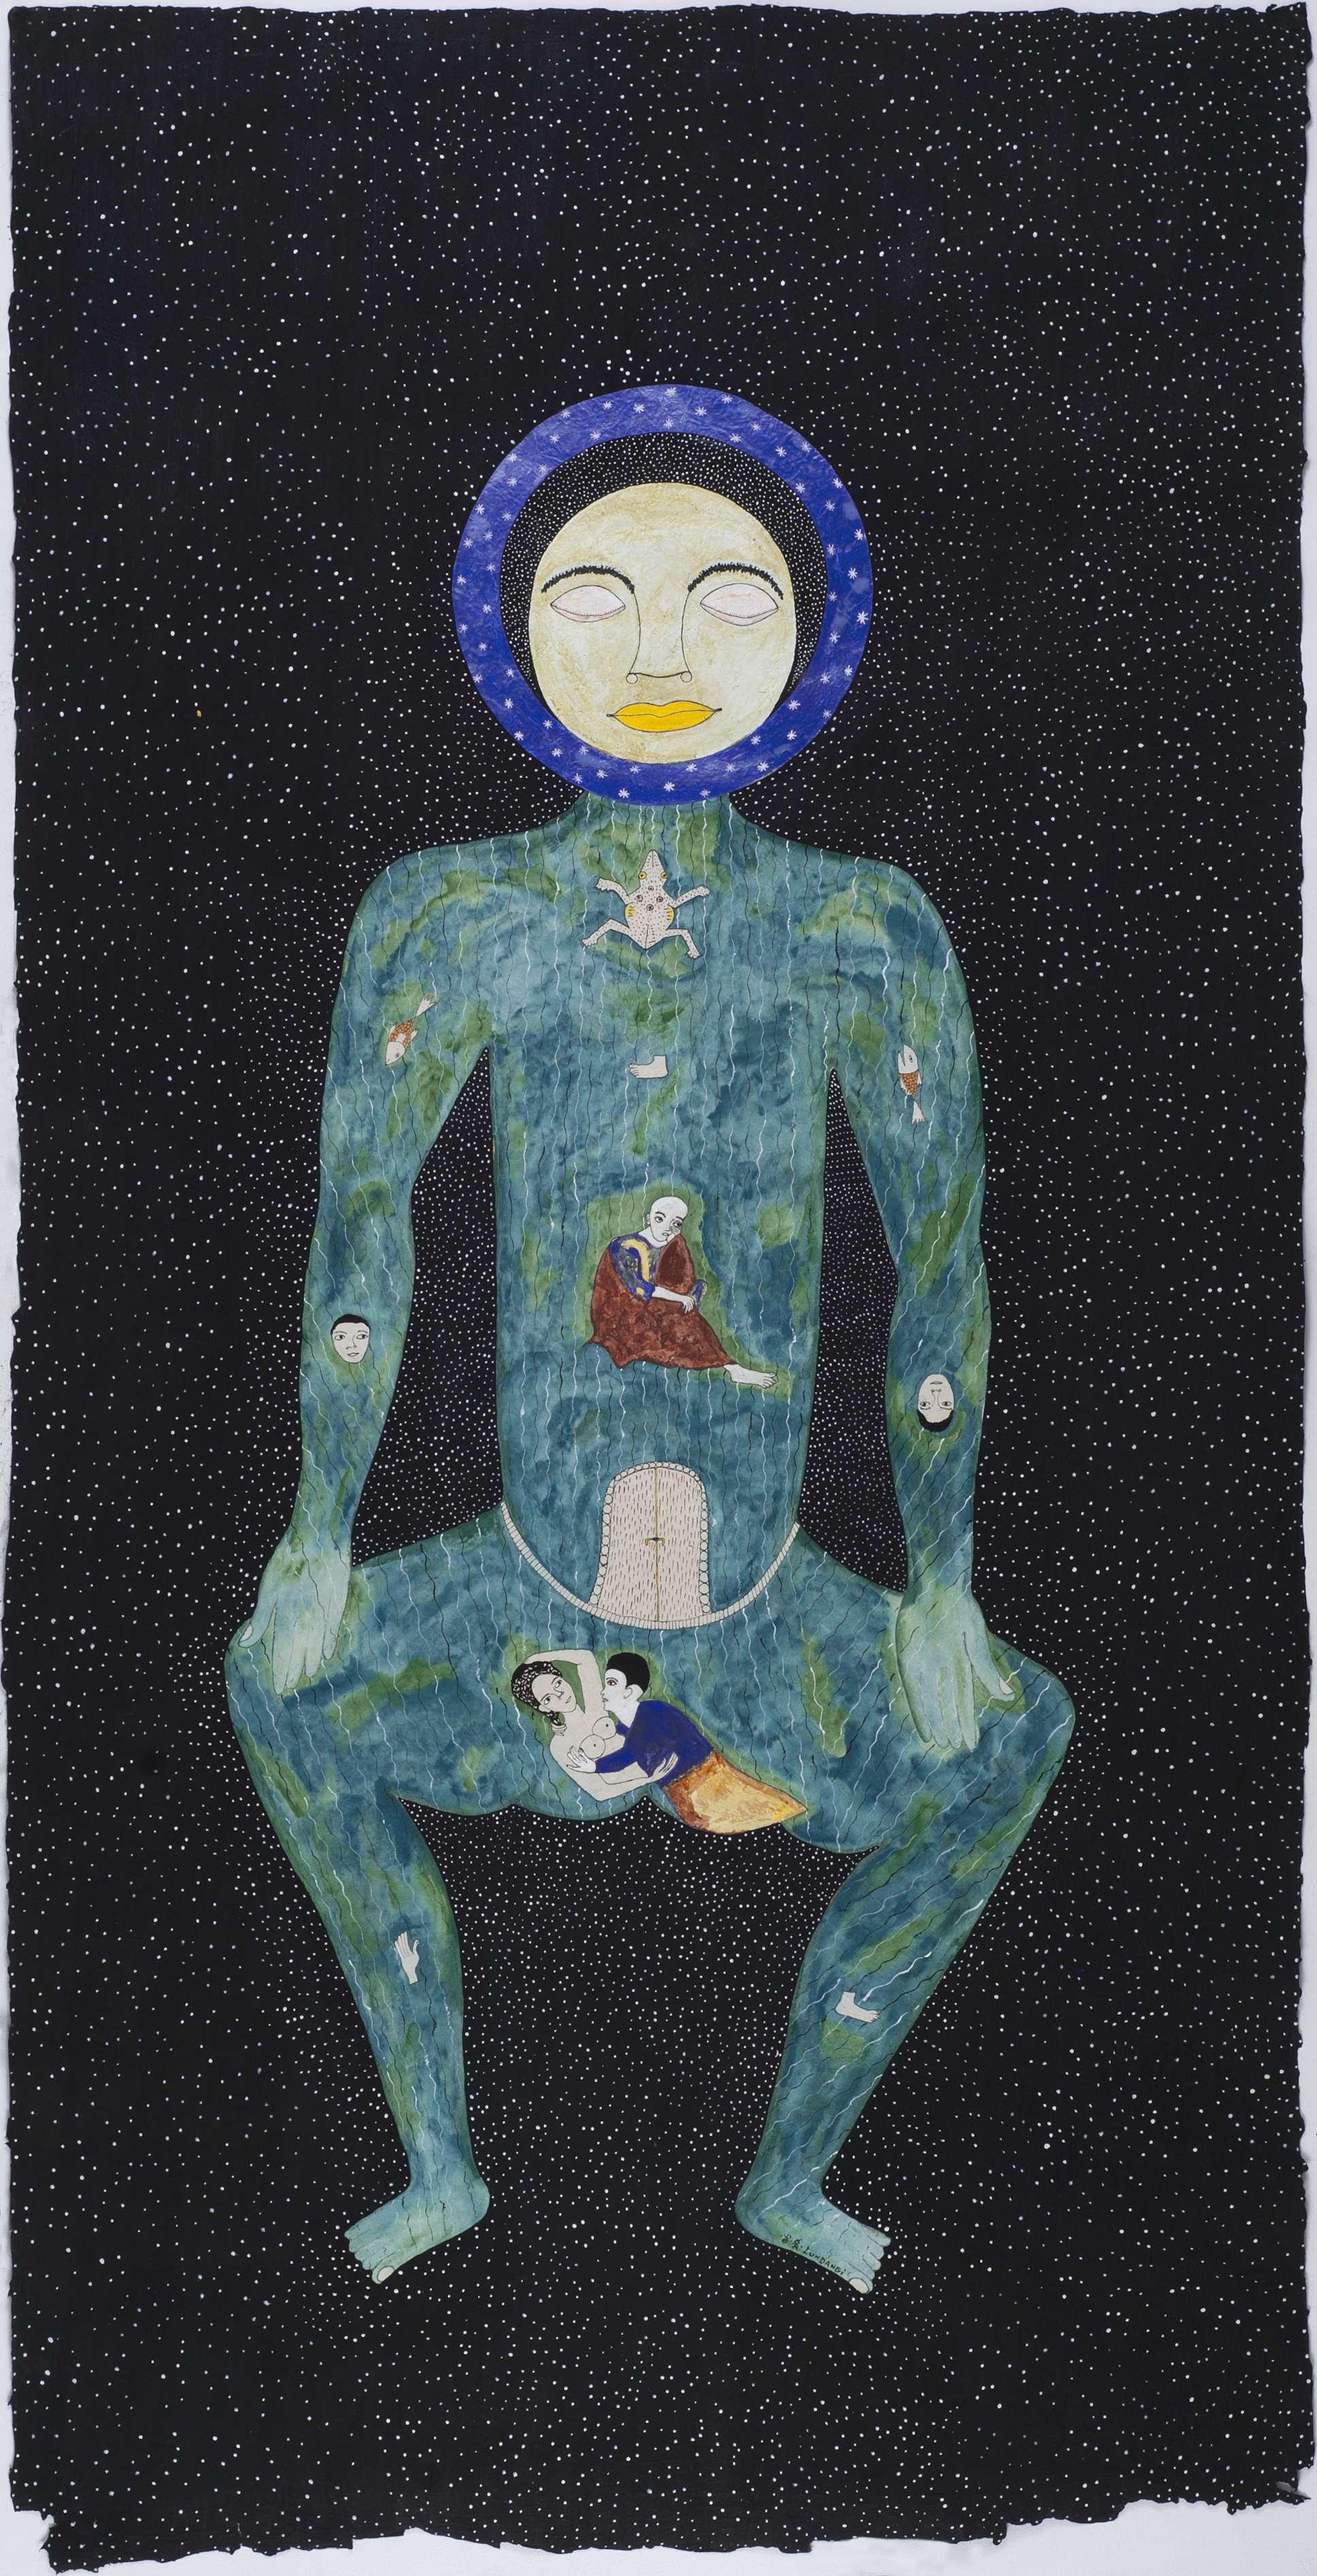 Franck K. Lundangi    Man Universe  , 2012 Pigment acrylic, watercolor on paper 36.5 x 72.25 inches / 92.7 x 183.5 cm / FLu 31